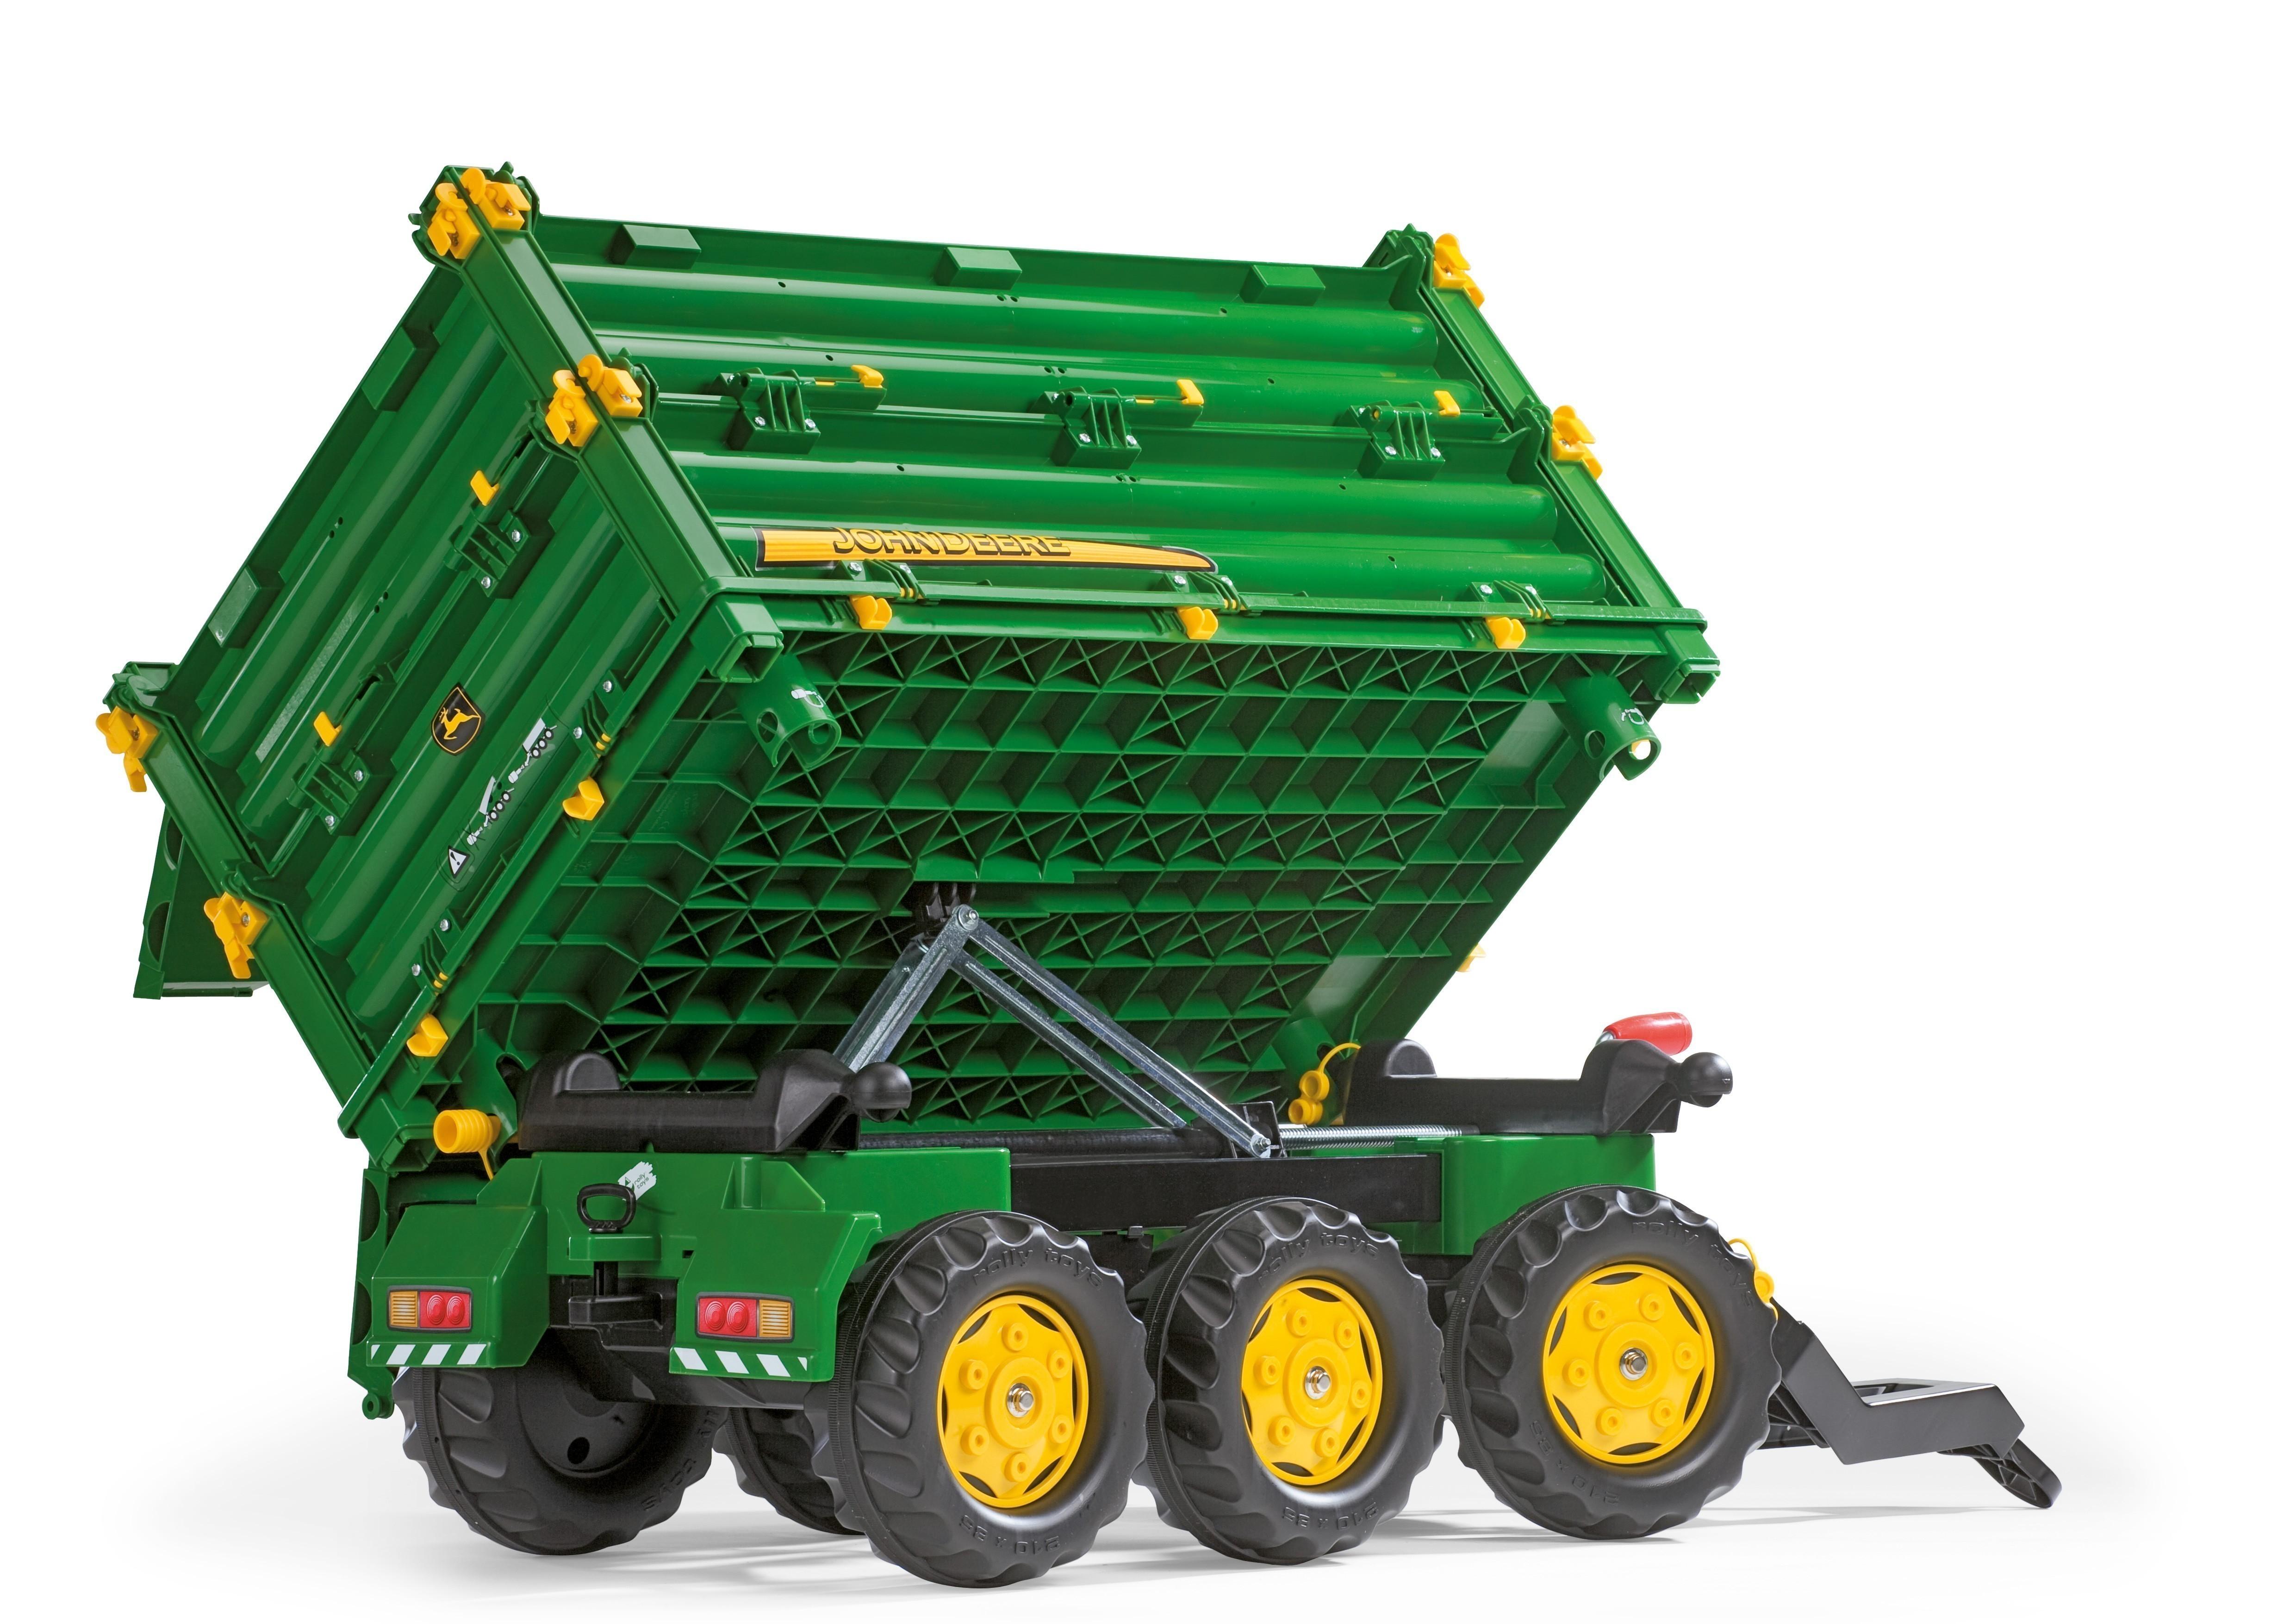 Anhänger für Tretfahrzeug rolly Multi Trailer John Deere - Rolly Toys Bild 4